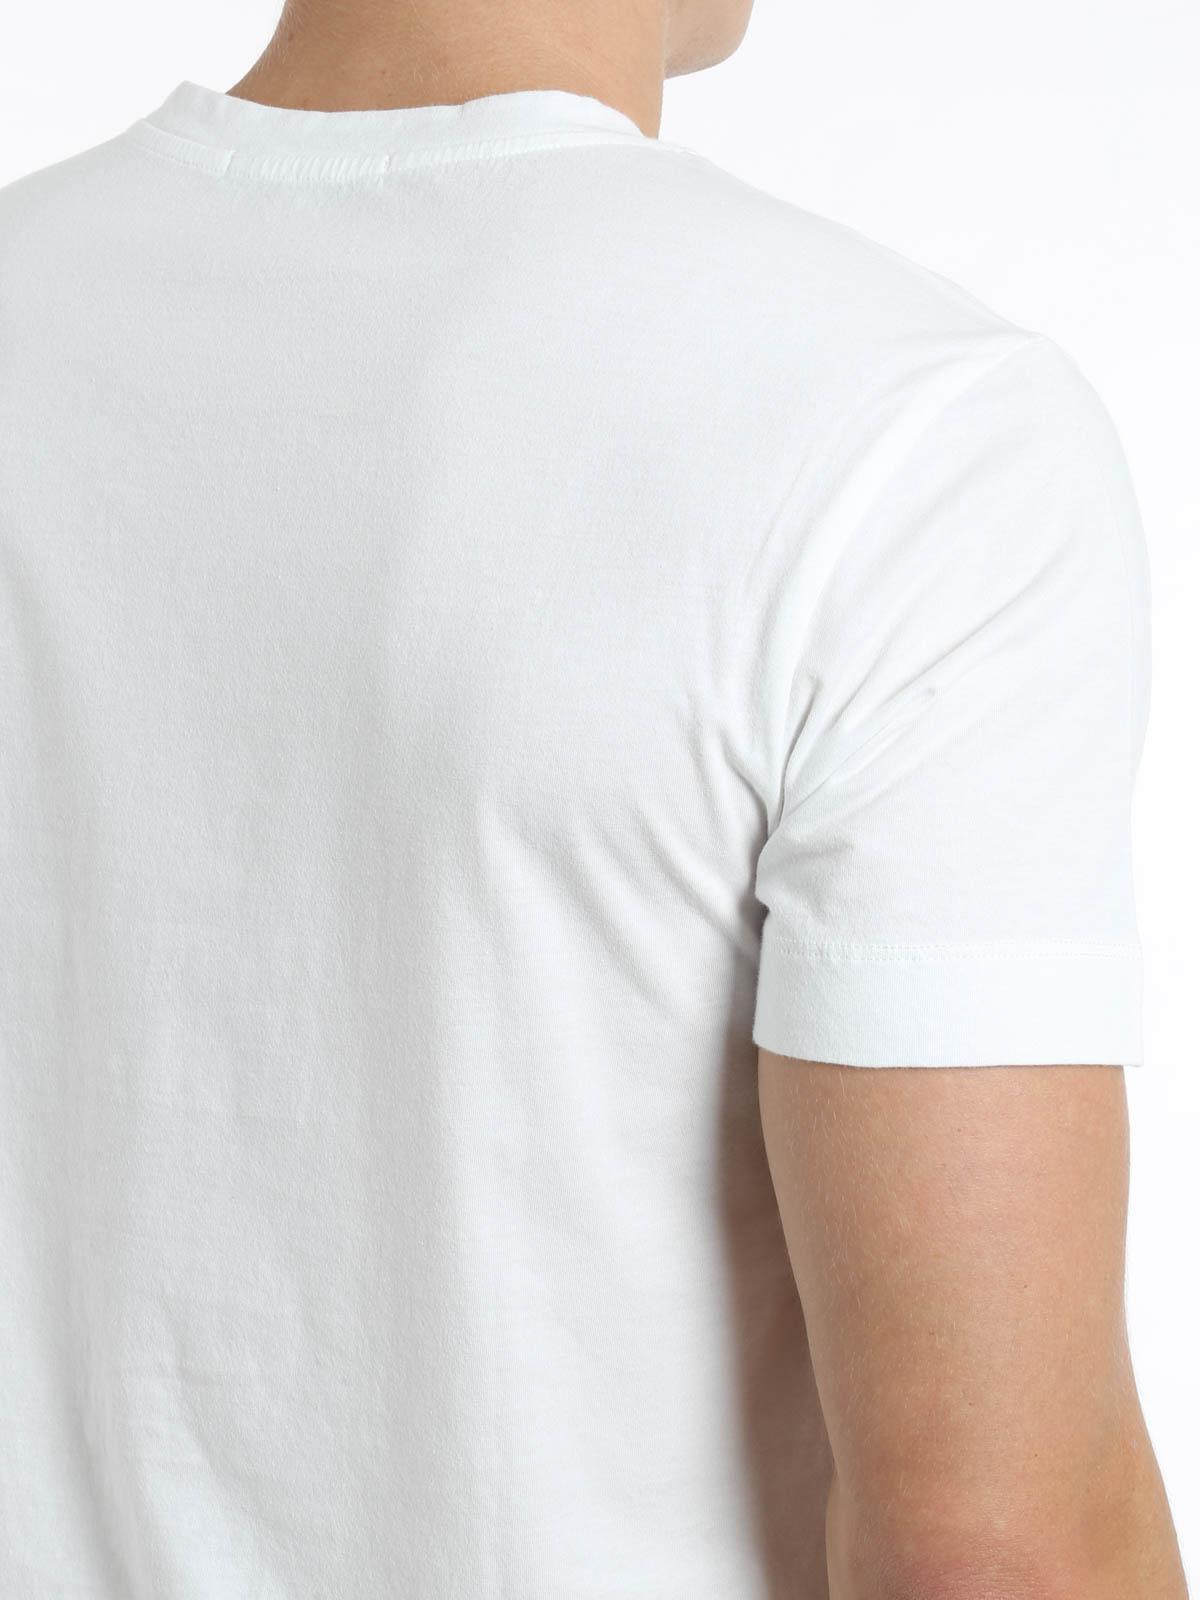 V neck side print t shirt de pierre balmain t shirts for V neck t shirt online shopping